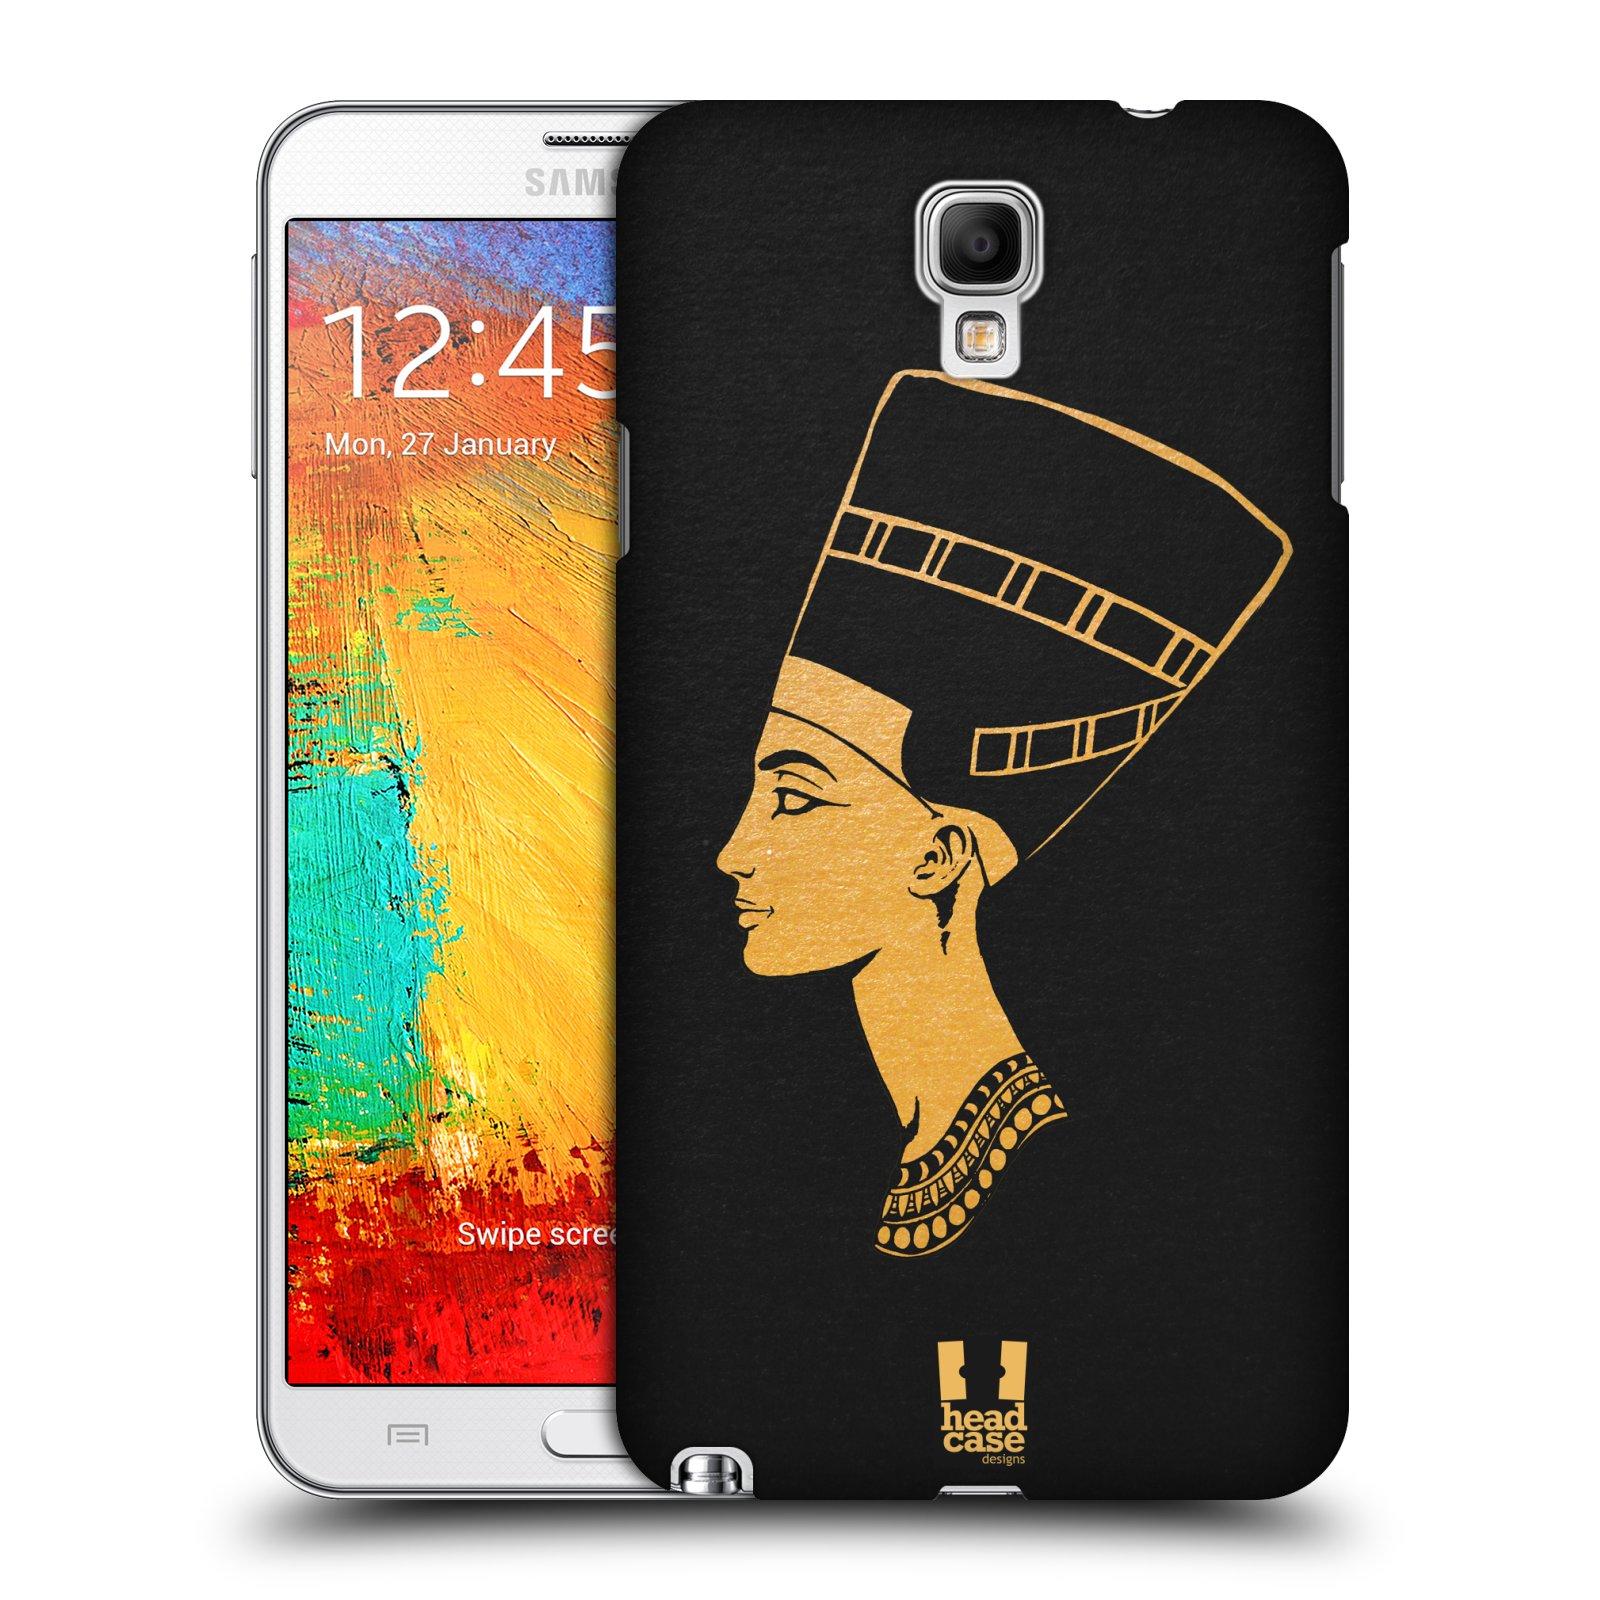 Plastové pouzdro na mobil Samsung Galaxy Note 3 Neo HEAD CASE EGYPT NEFERTITI (Kryt či obal na mobilní telefon Samsung Galaxy Note 3 Neo SM-N7505)